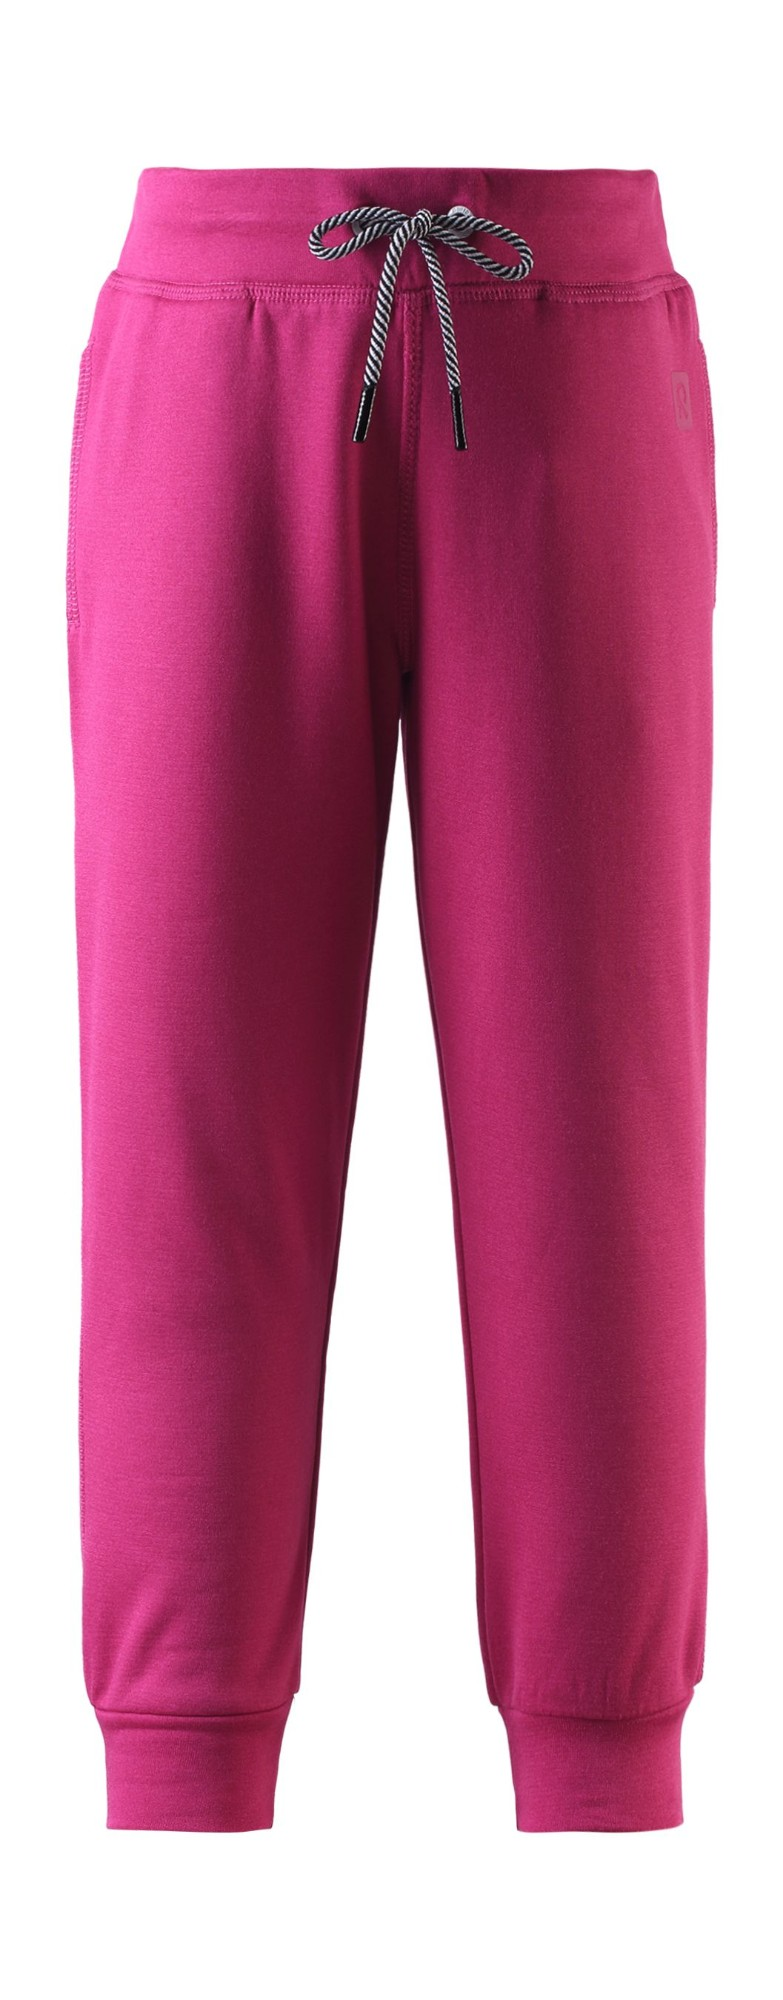 REIMA Pehmyt Raspberry Pink 116